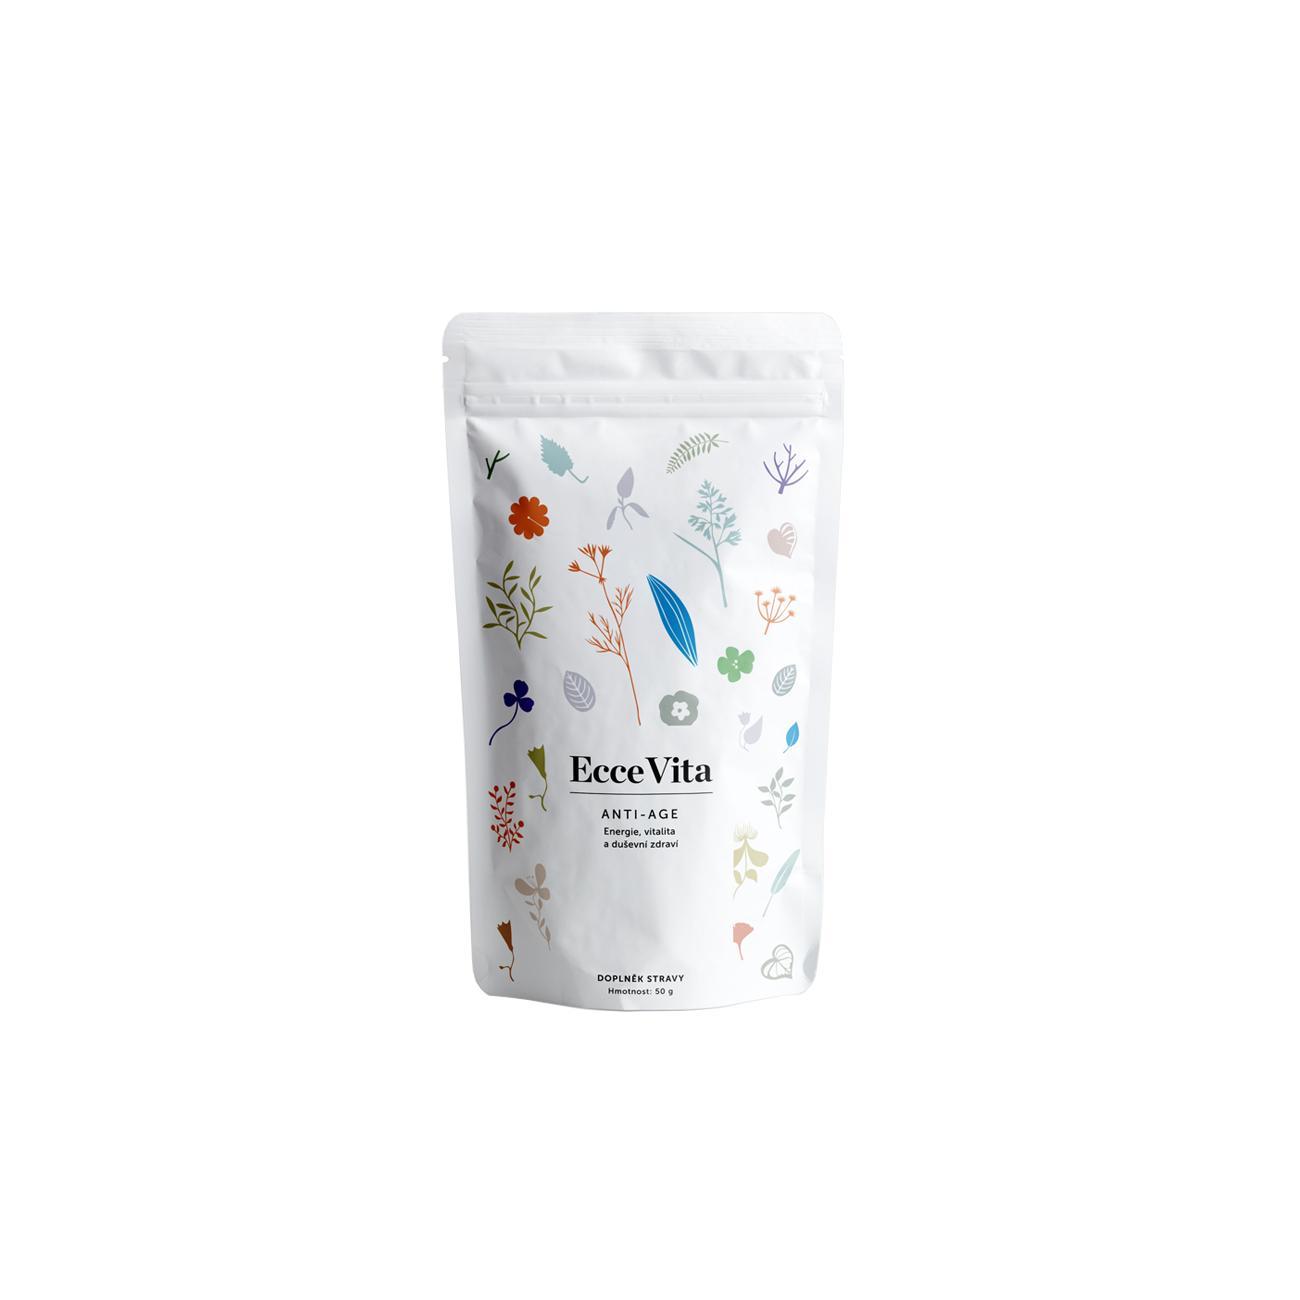 Ecce Vita Bylinný čaj Anti-age 50 g